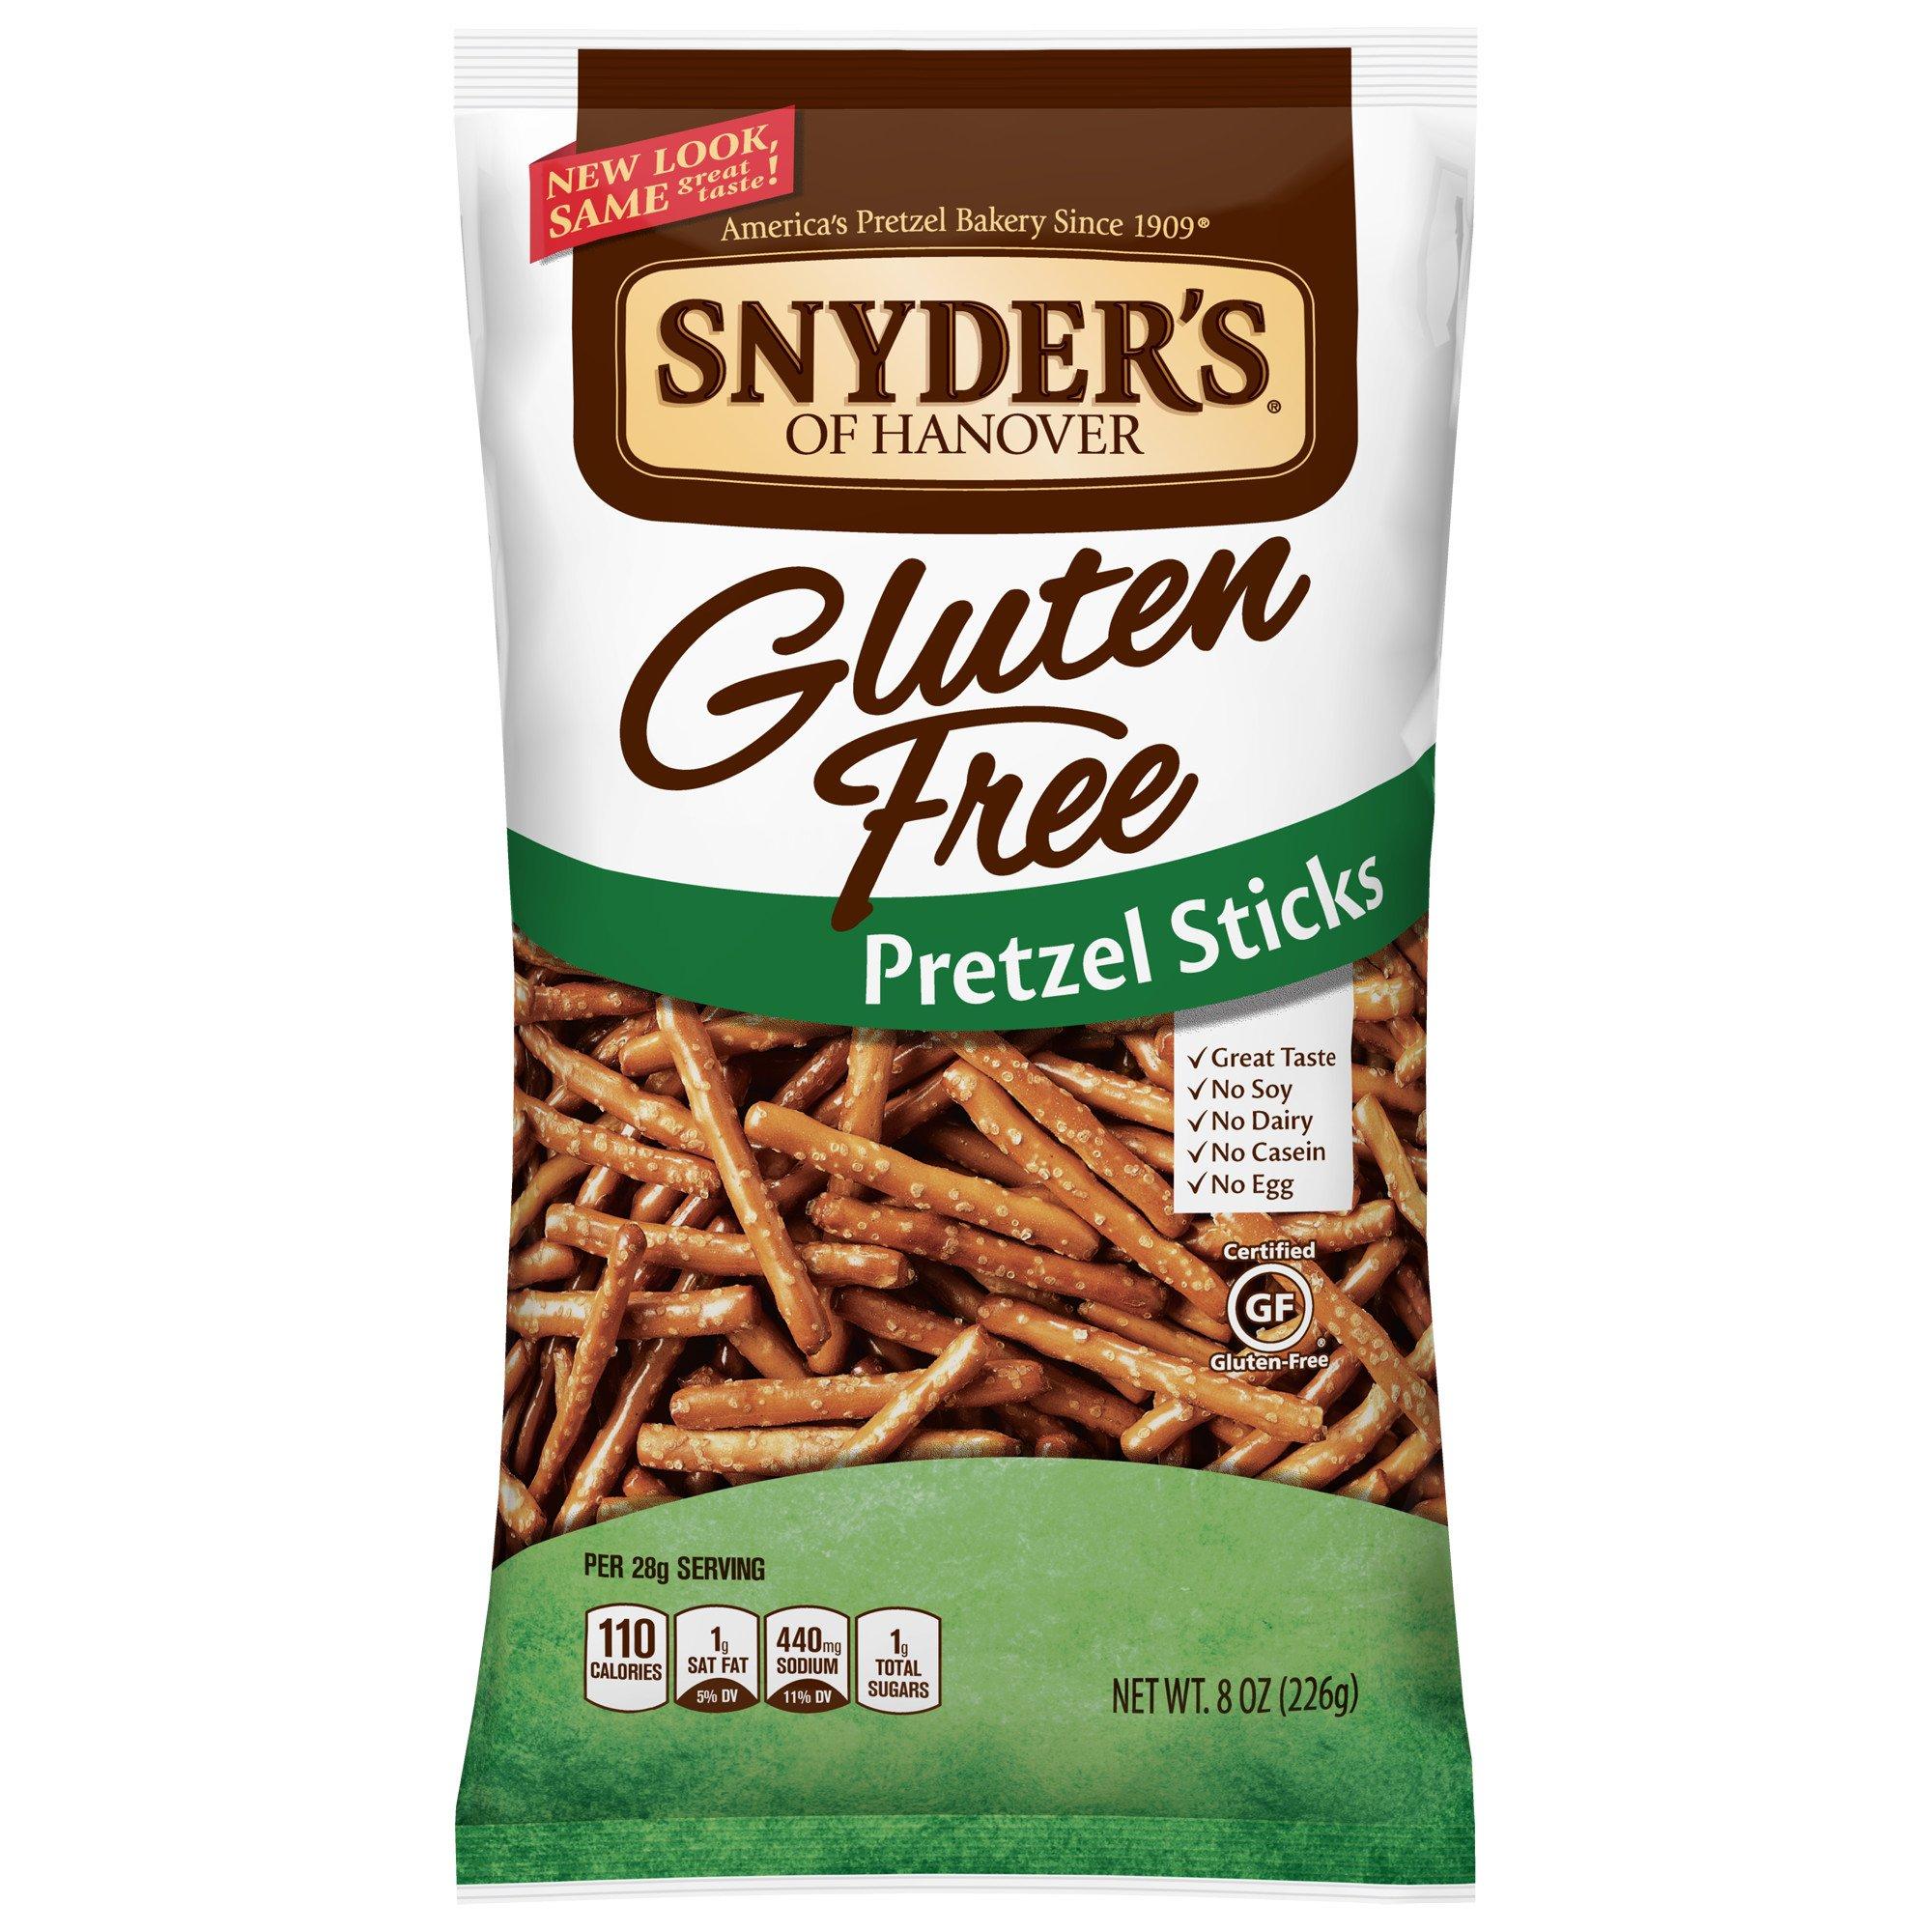 Snyder's of Hanover Gluten Free Pretzel Sticks, 8 Ounce (Pack of 12) by Snyder's of Hanover